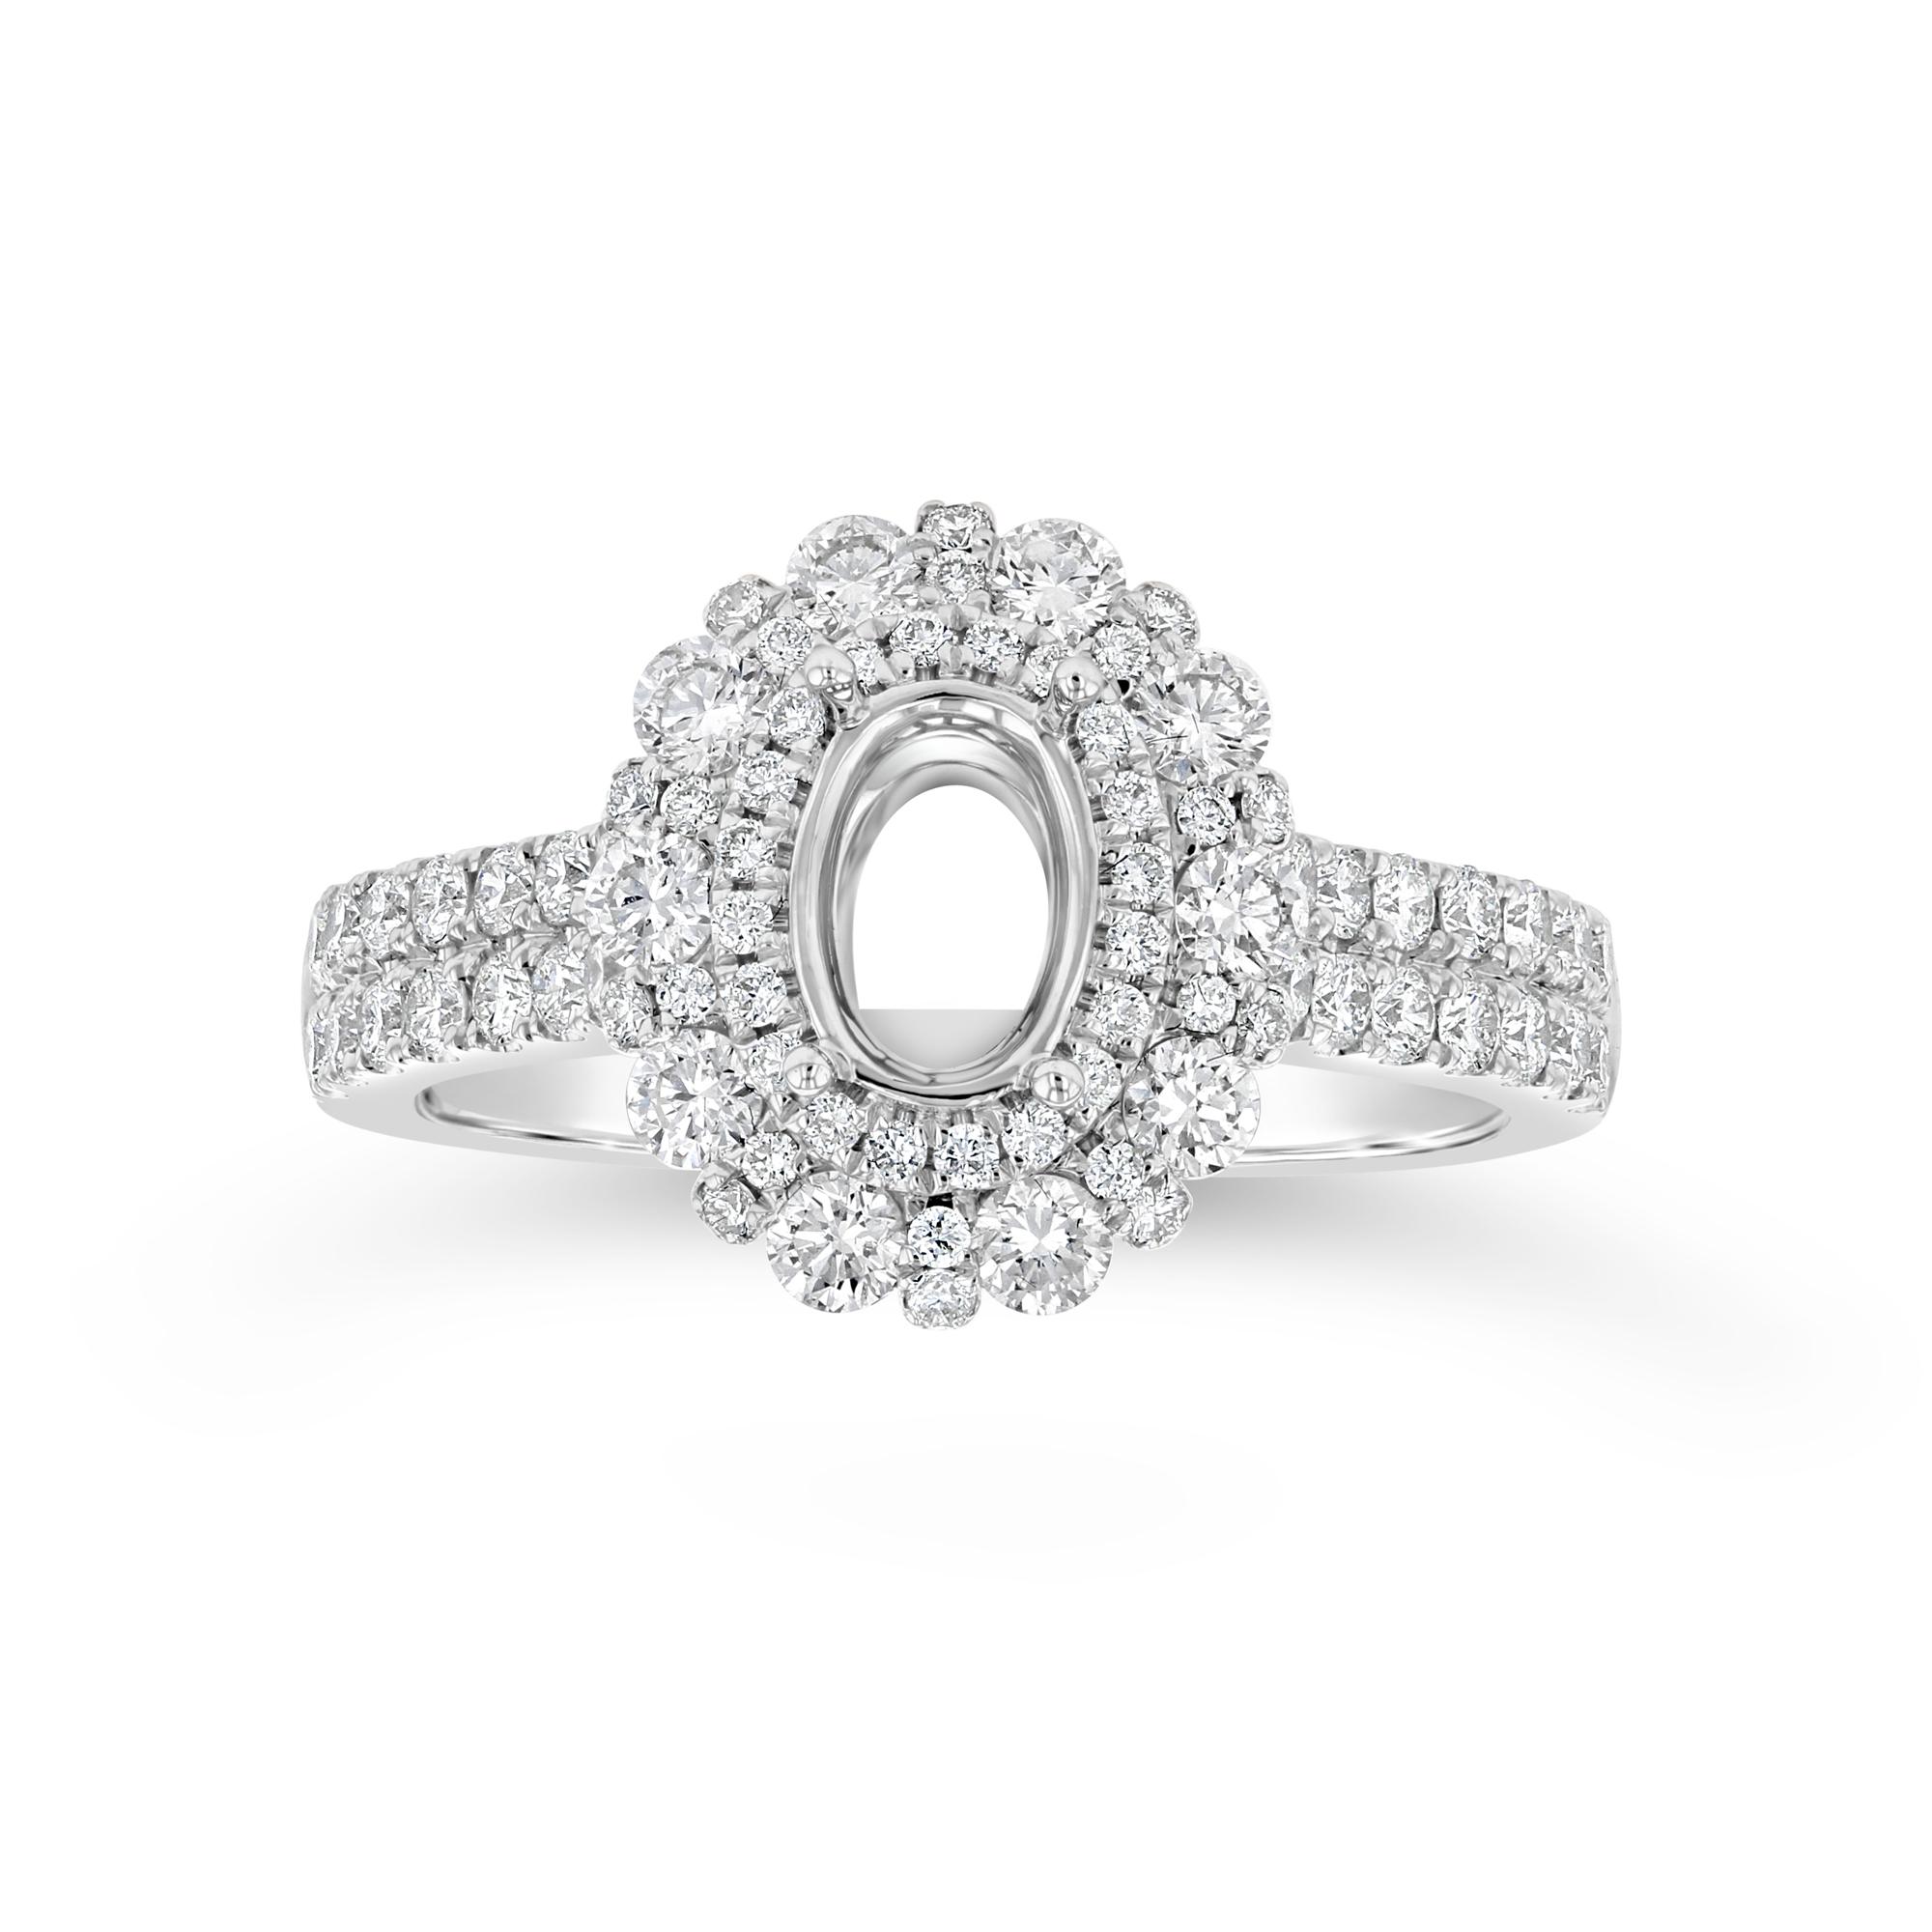 View 0.94ctw Diamond Double Halo Semi Mount Ring in 18k White Gold